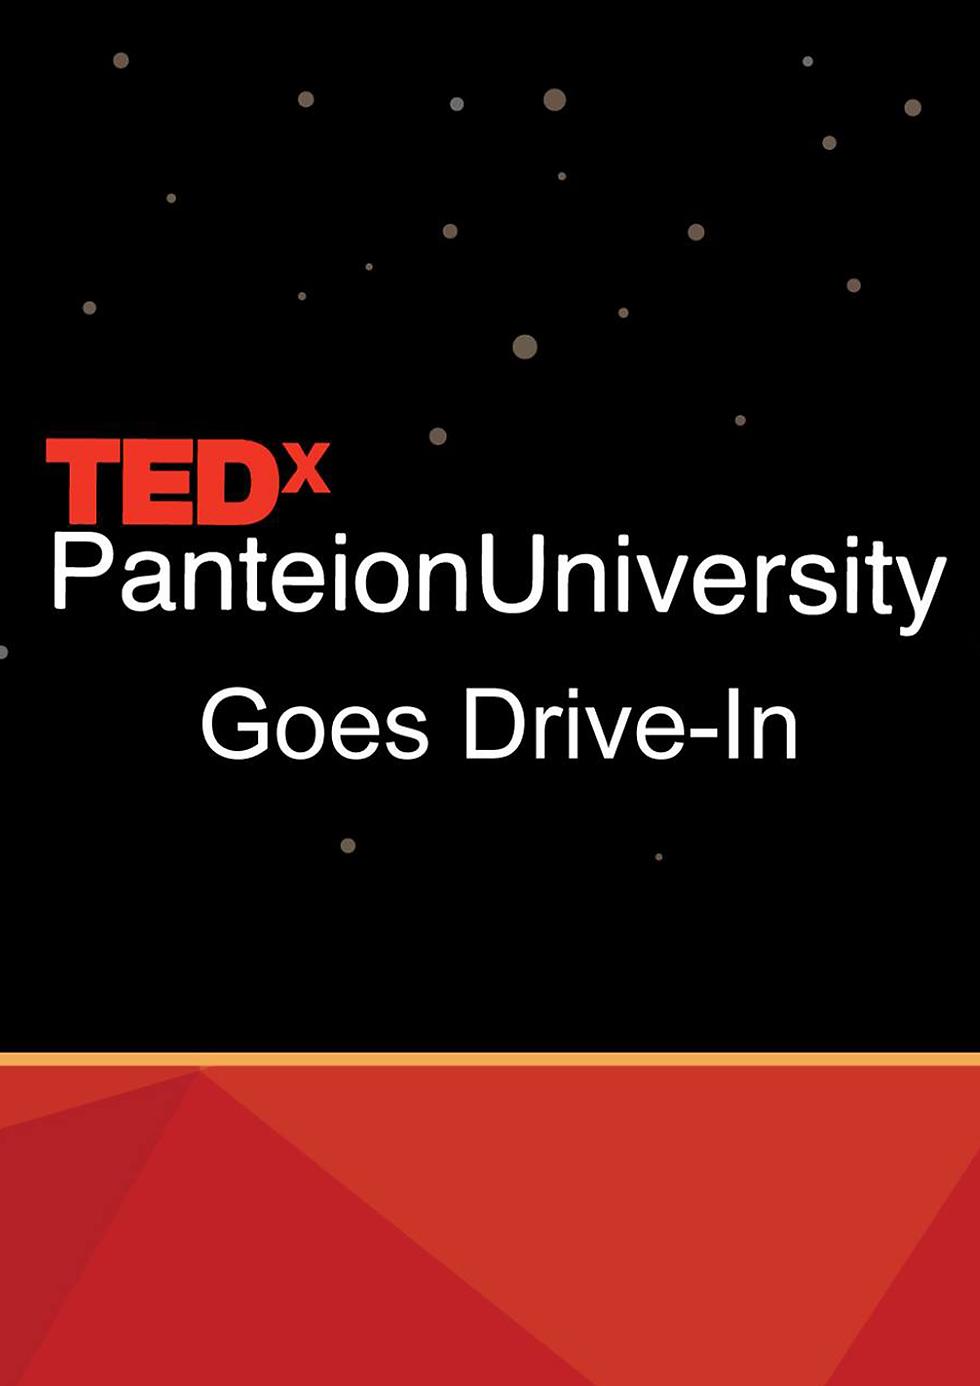 TEDx PanteionUniversity